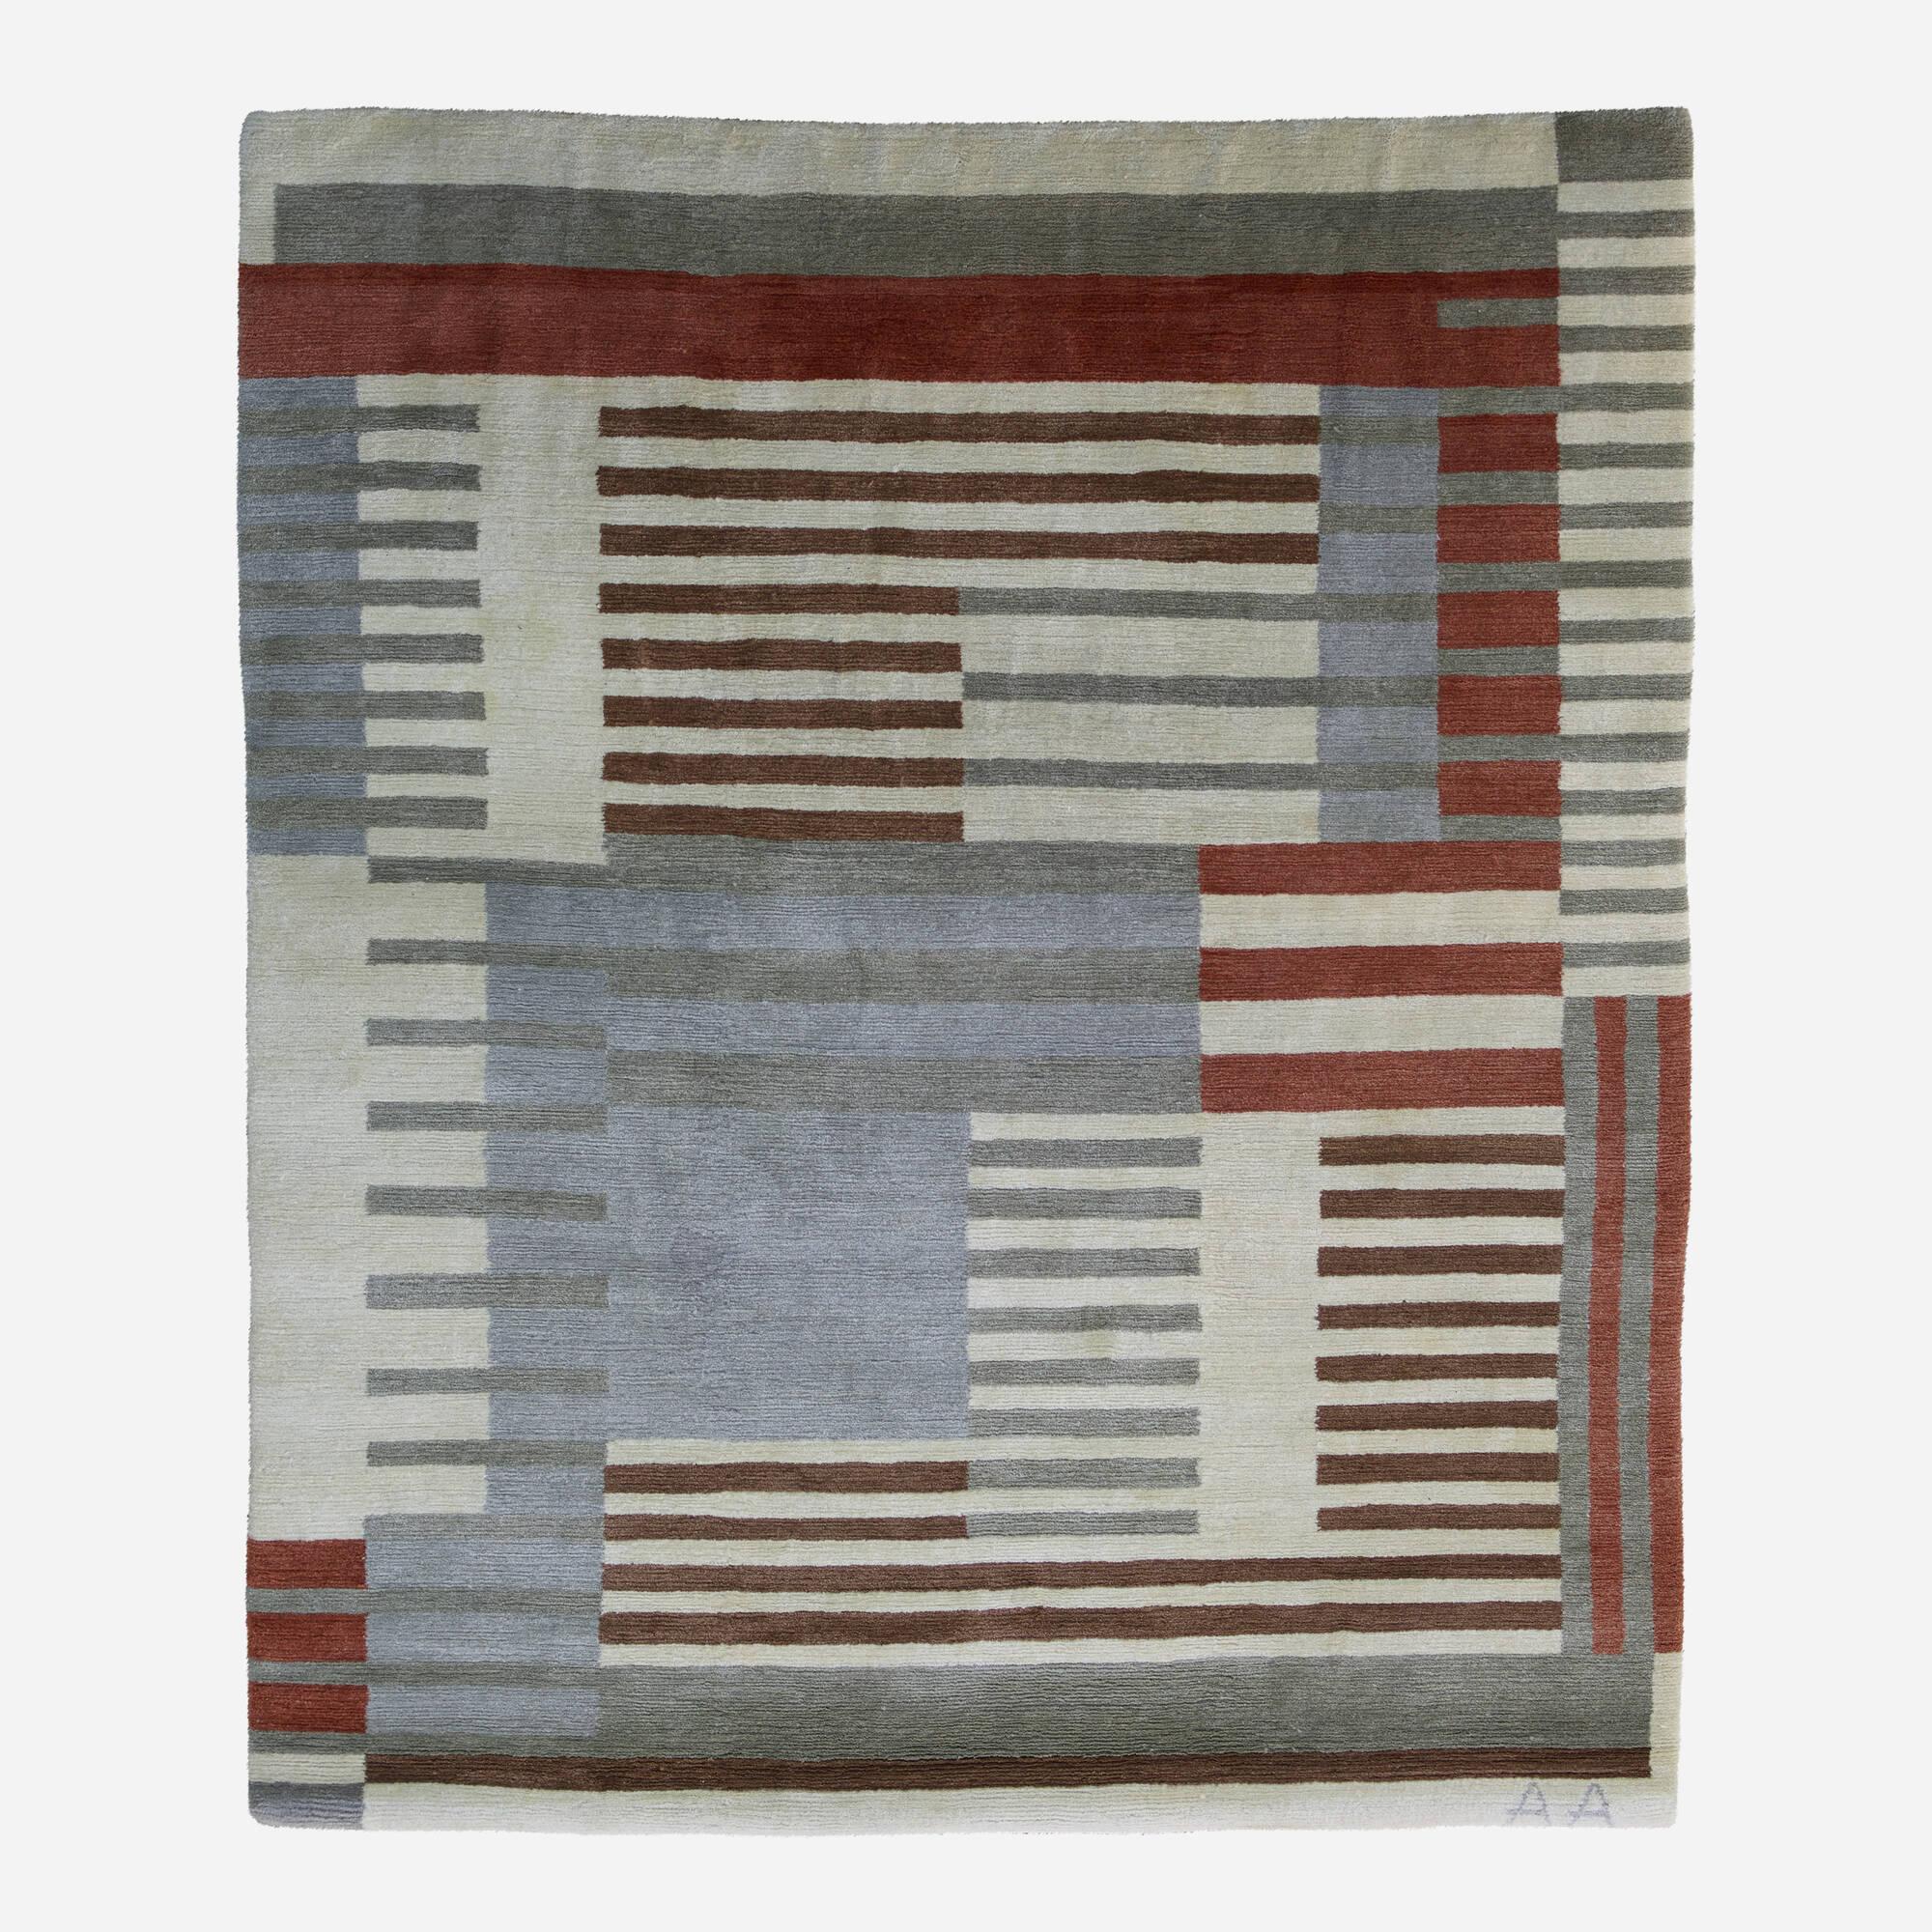 198: Anni Albers / Smyrna rug (1 of 1)